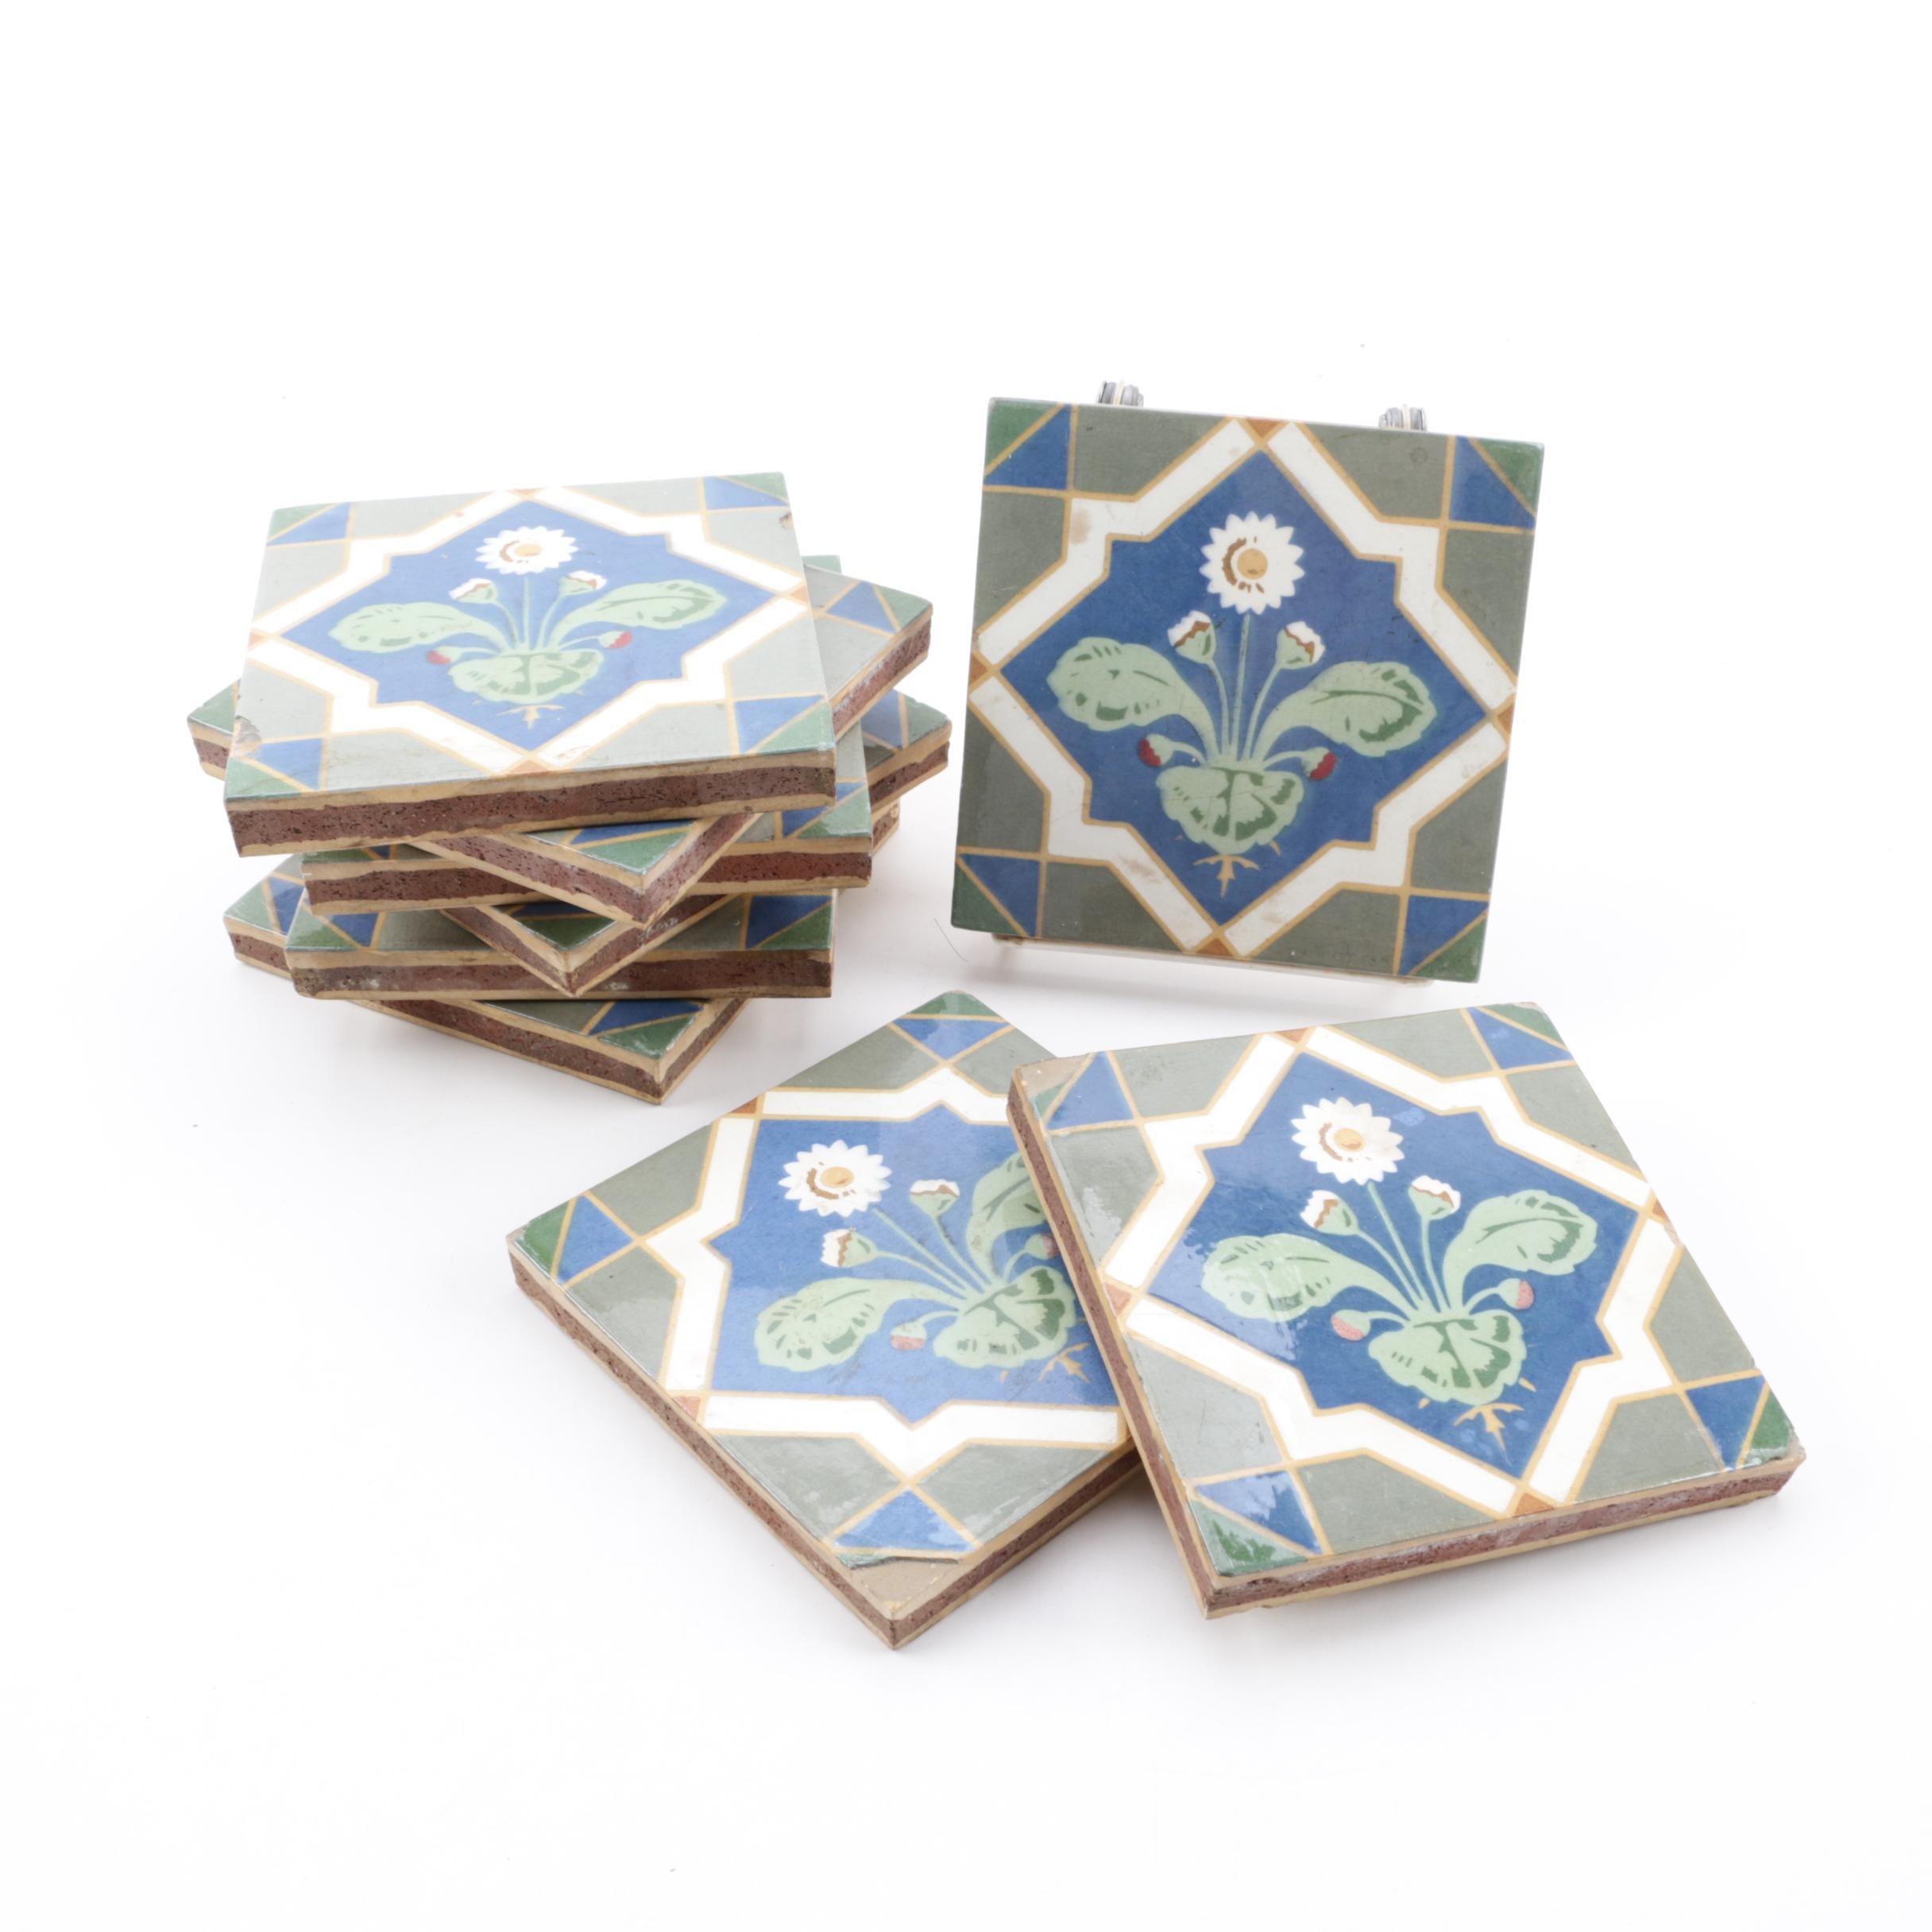 Rare Robert Minton Taylor Earthenware Encaustic Sandwich Tiles